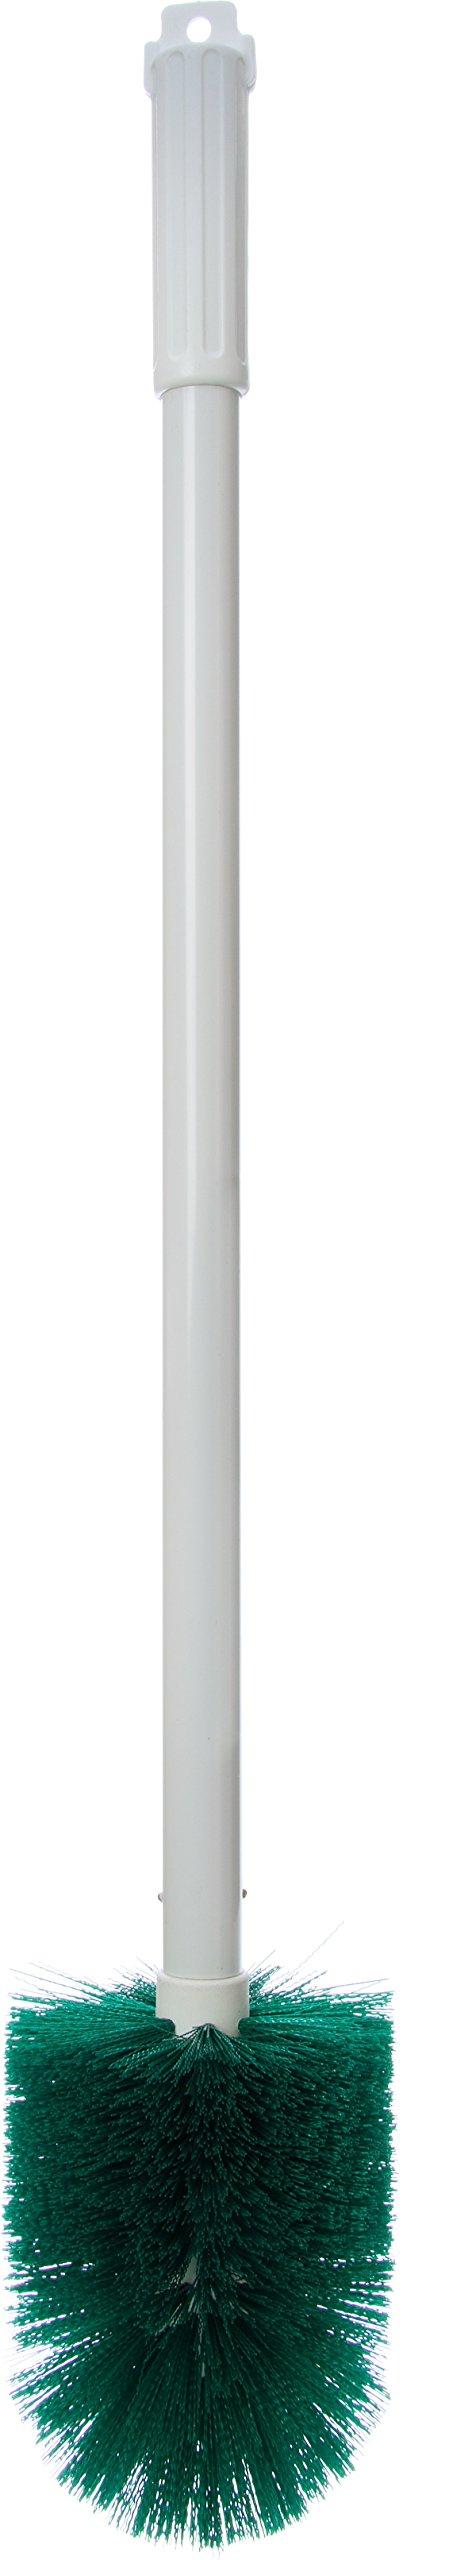 Carlisle 4000309 Multi-Purpose Oval Valve Brush, 3.5'' x 5'' Polyester Bristles, 30'' Length, Green by Carlisle (Image #5)